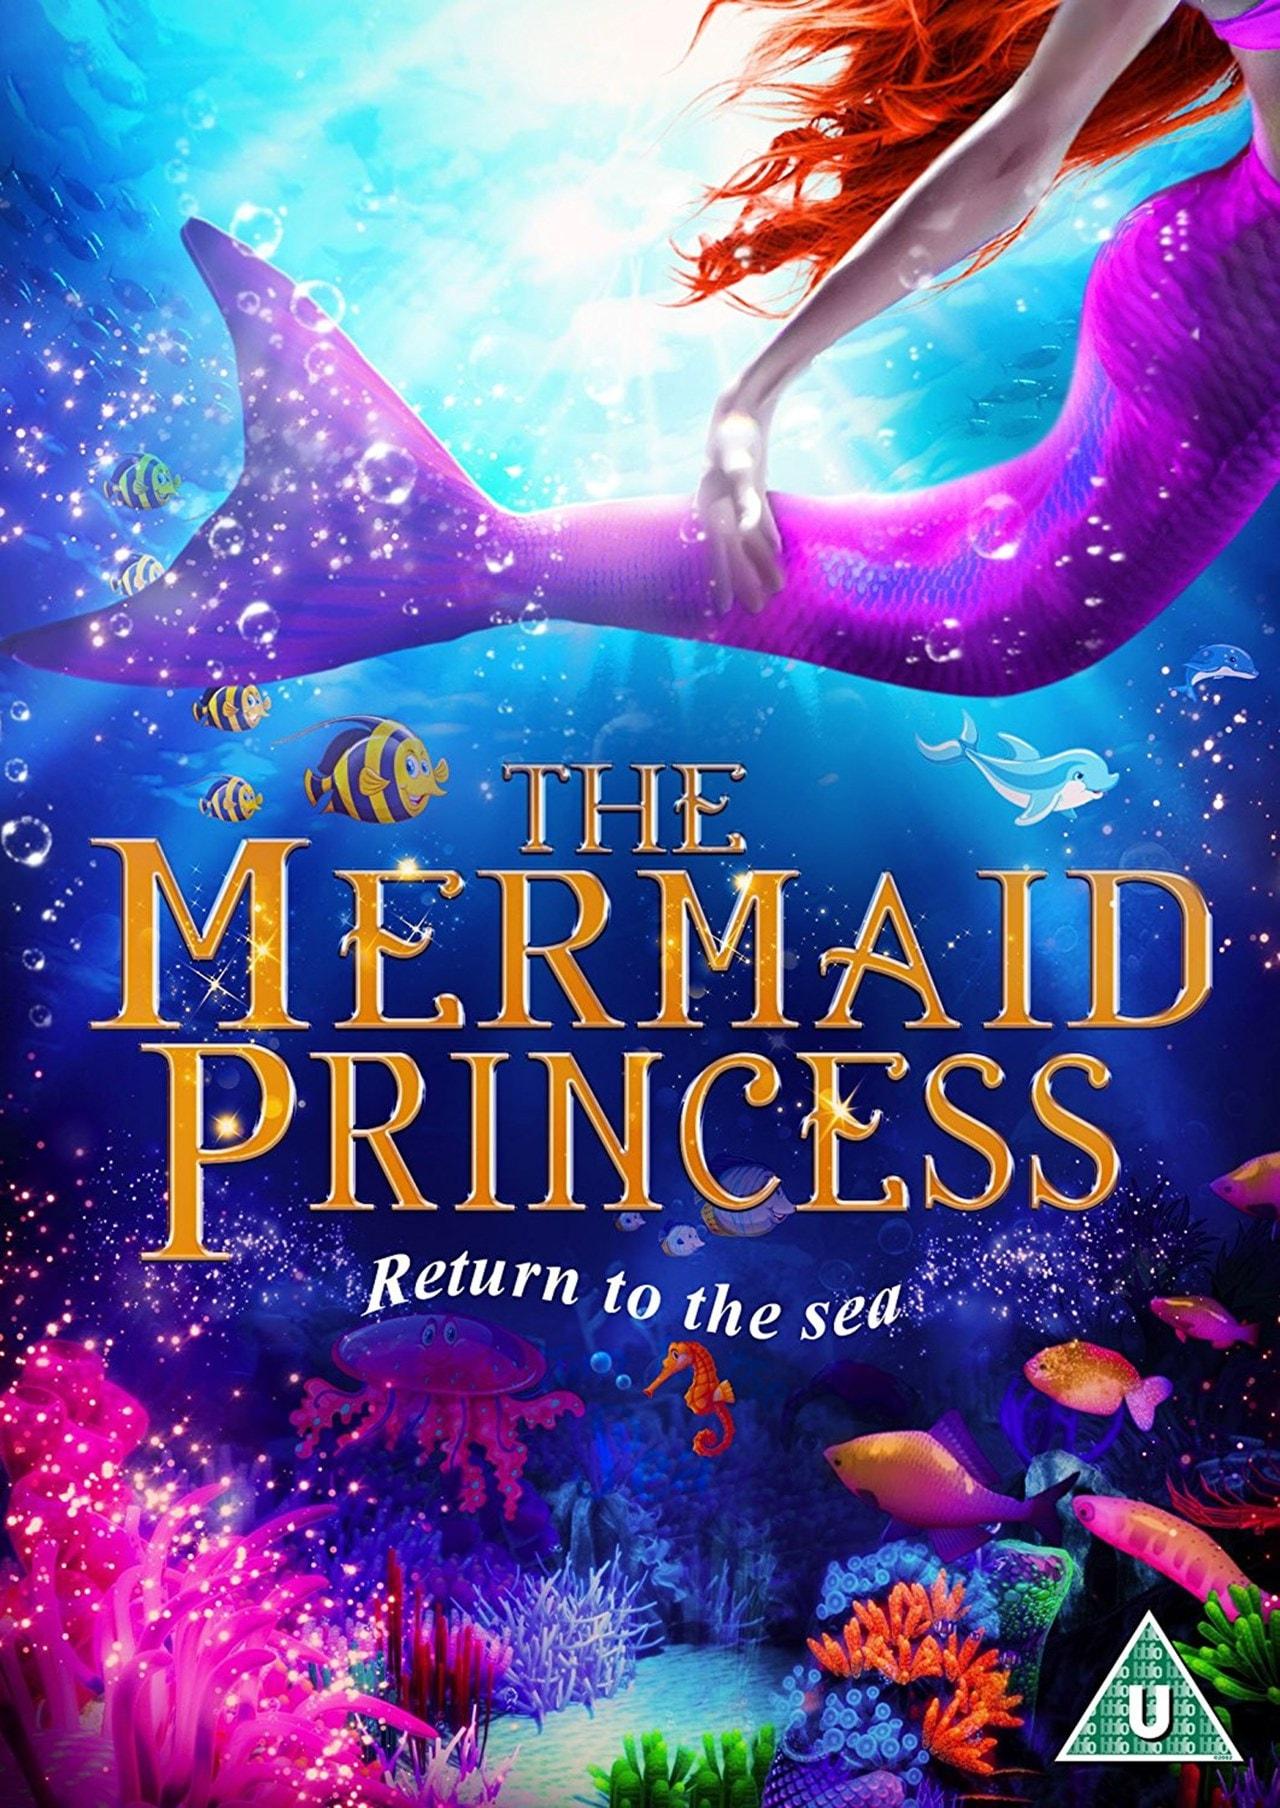 The Mermaid Princess - 1